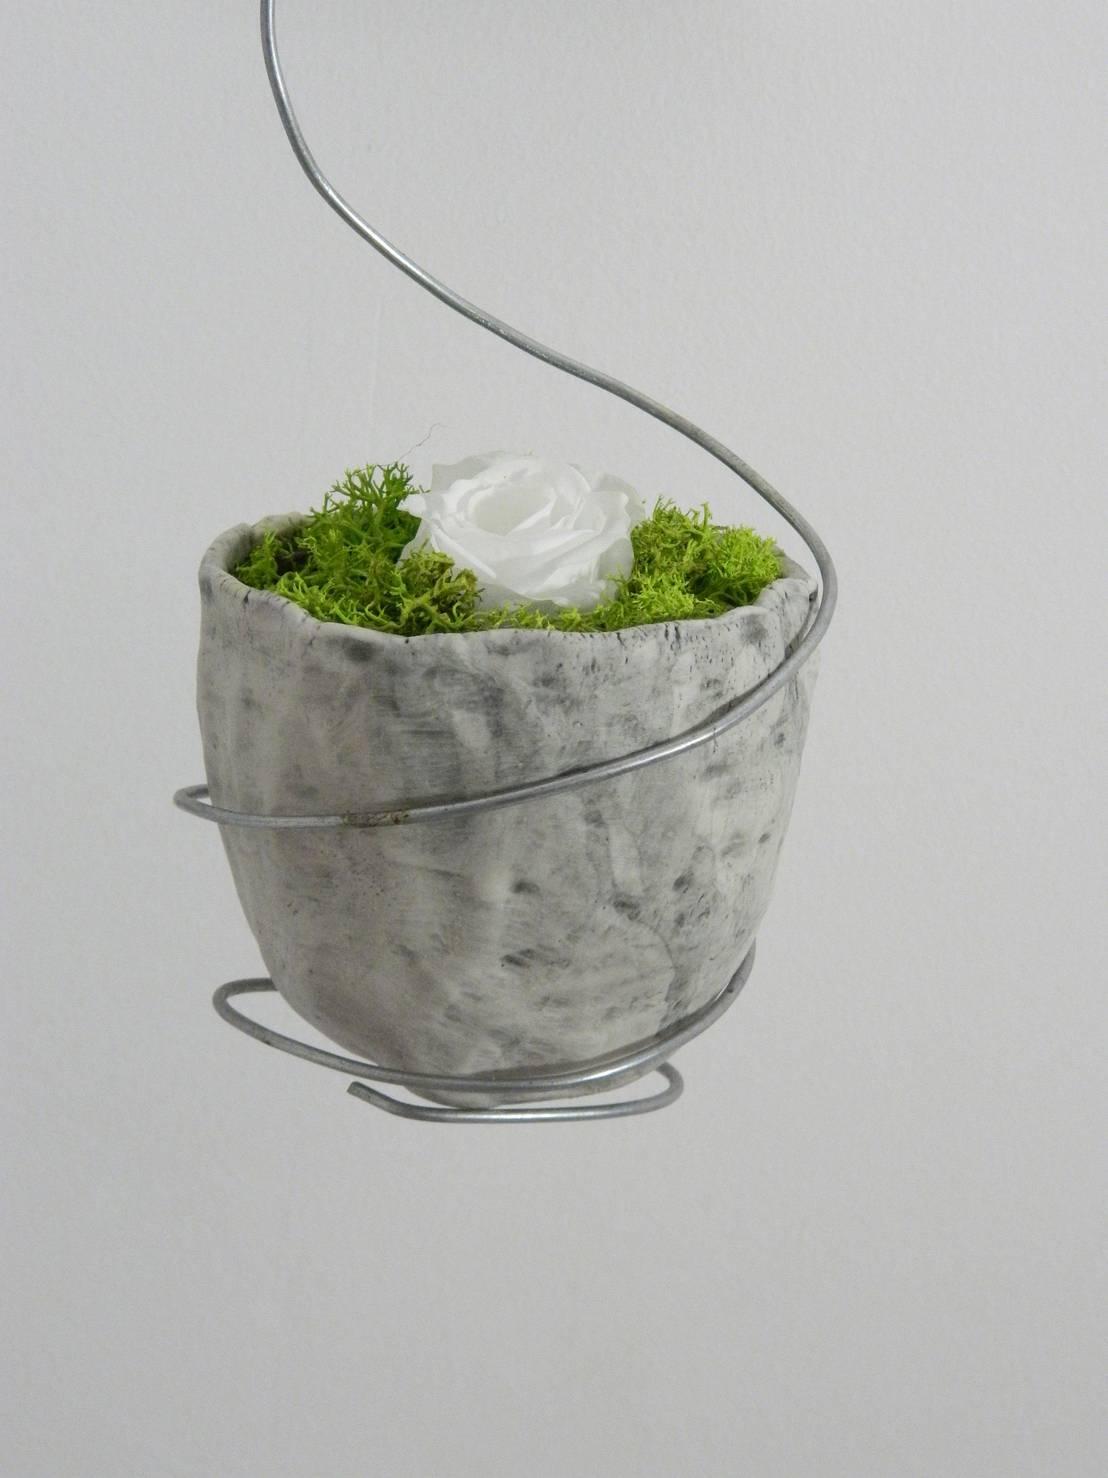 Vasi sospesi di ceramica artistica di chiara cantamessa for Vasi sospesi